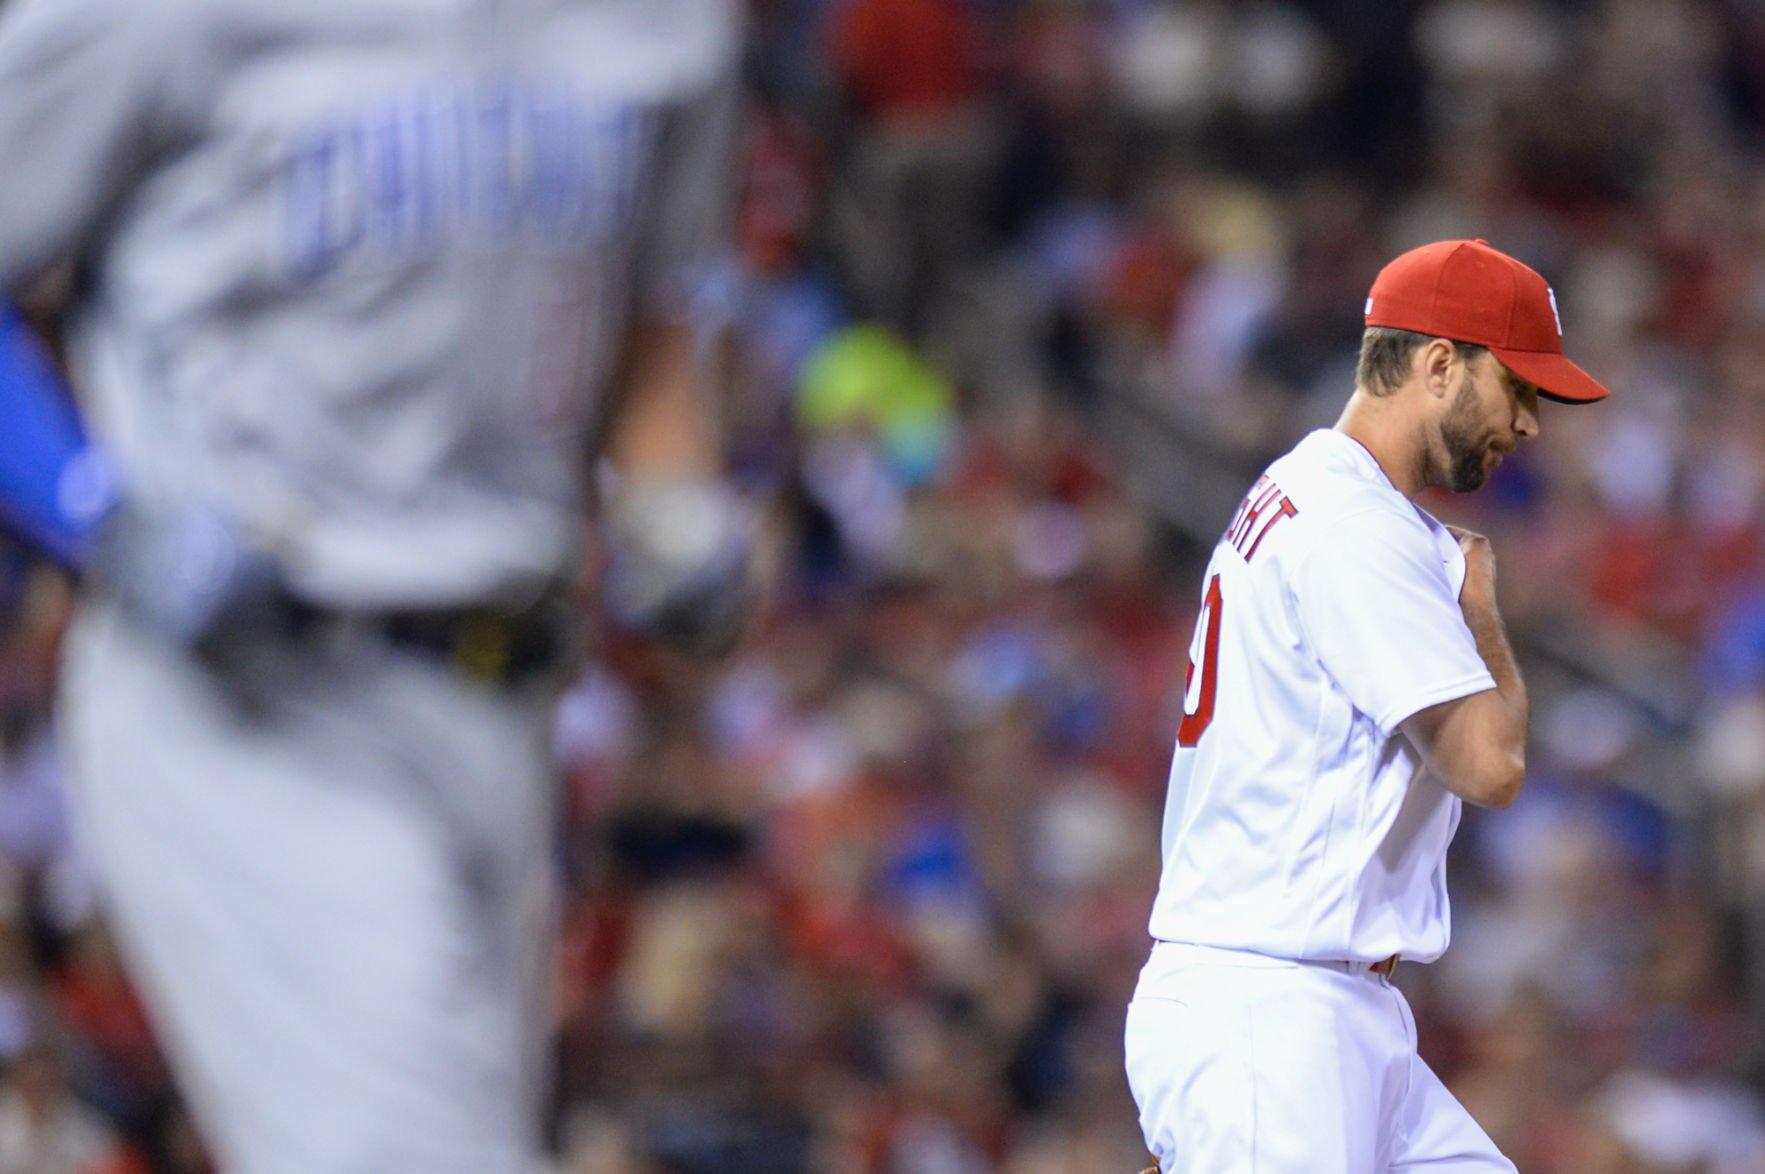 Don't raise strike zone, Wainwright says